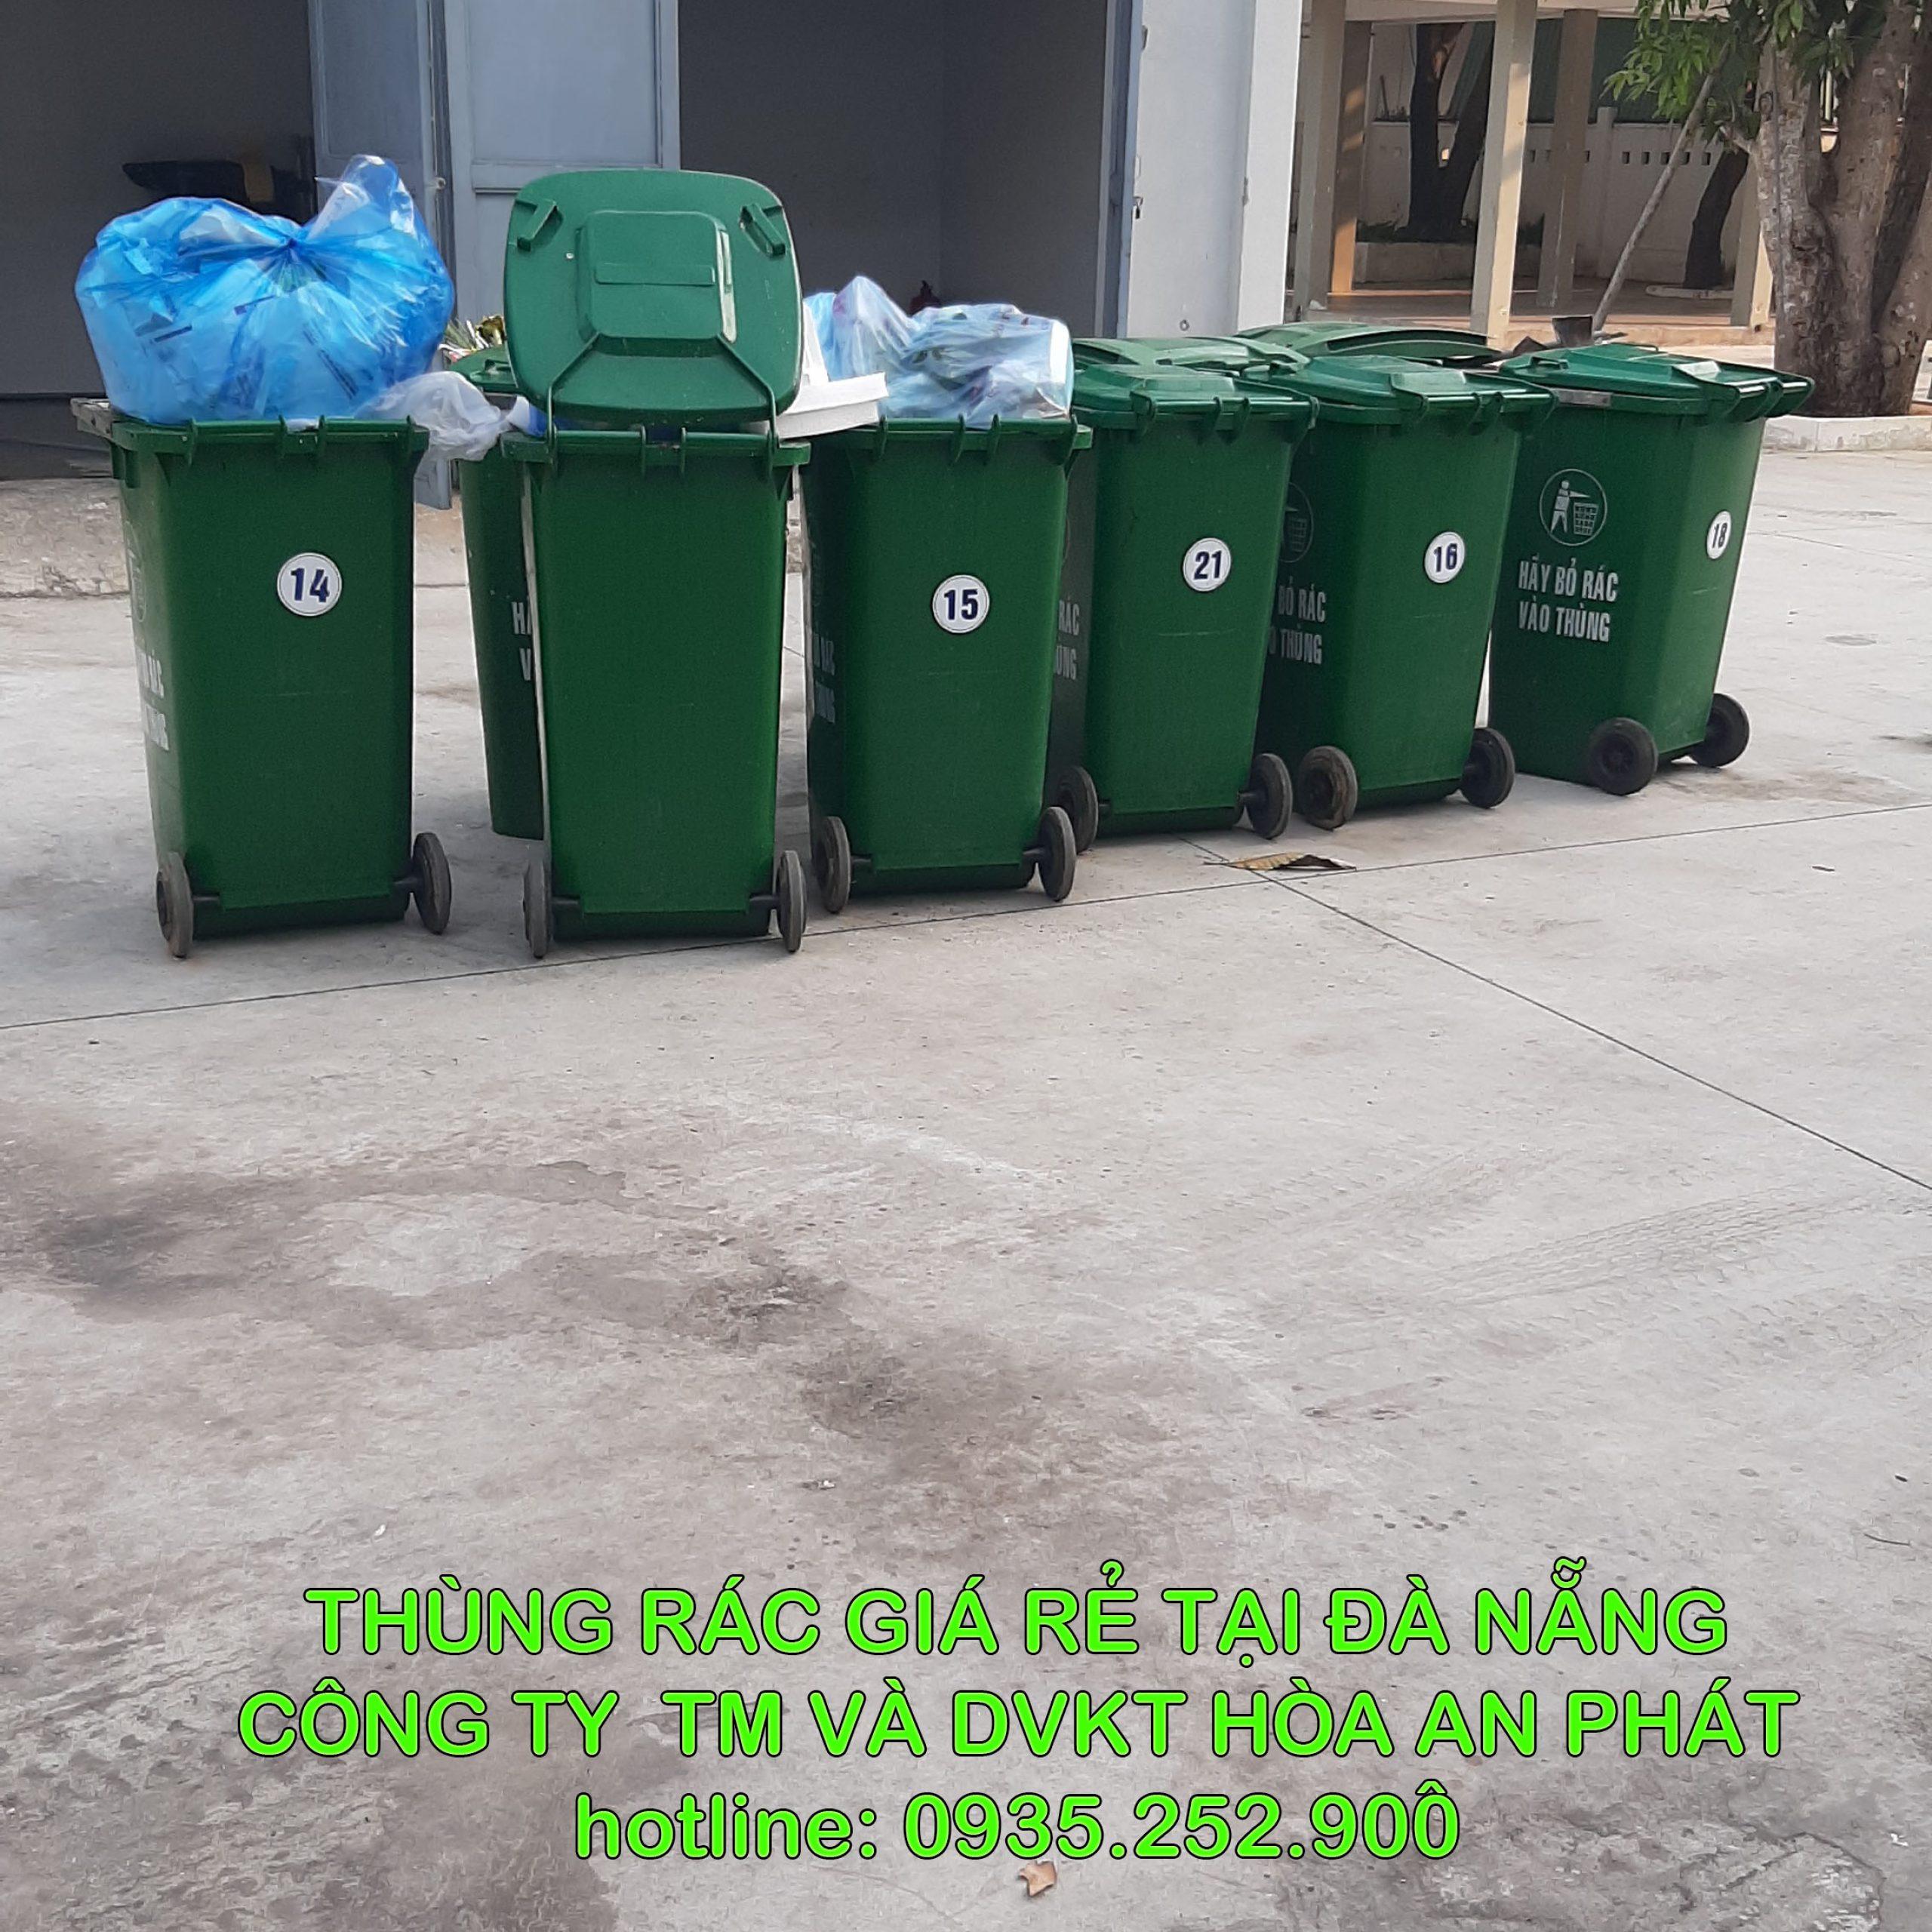 thung-tac-nhua-tai-benh-vien-C-da-nang